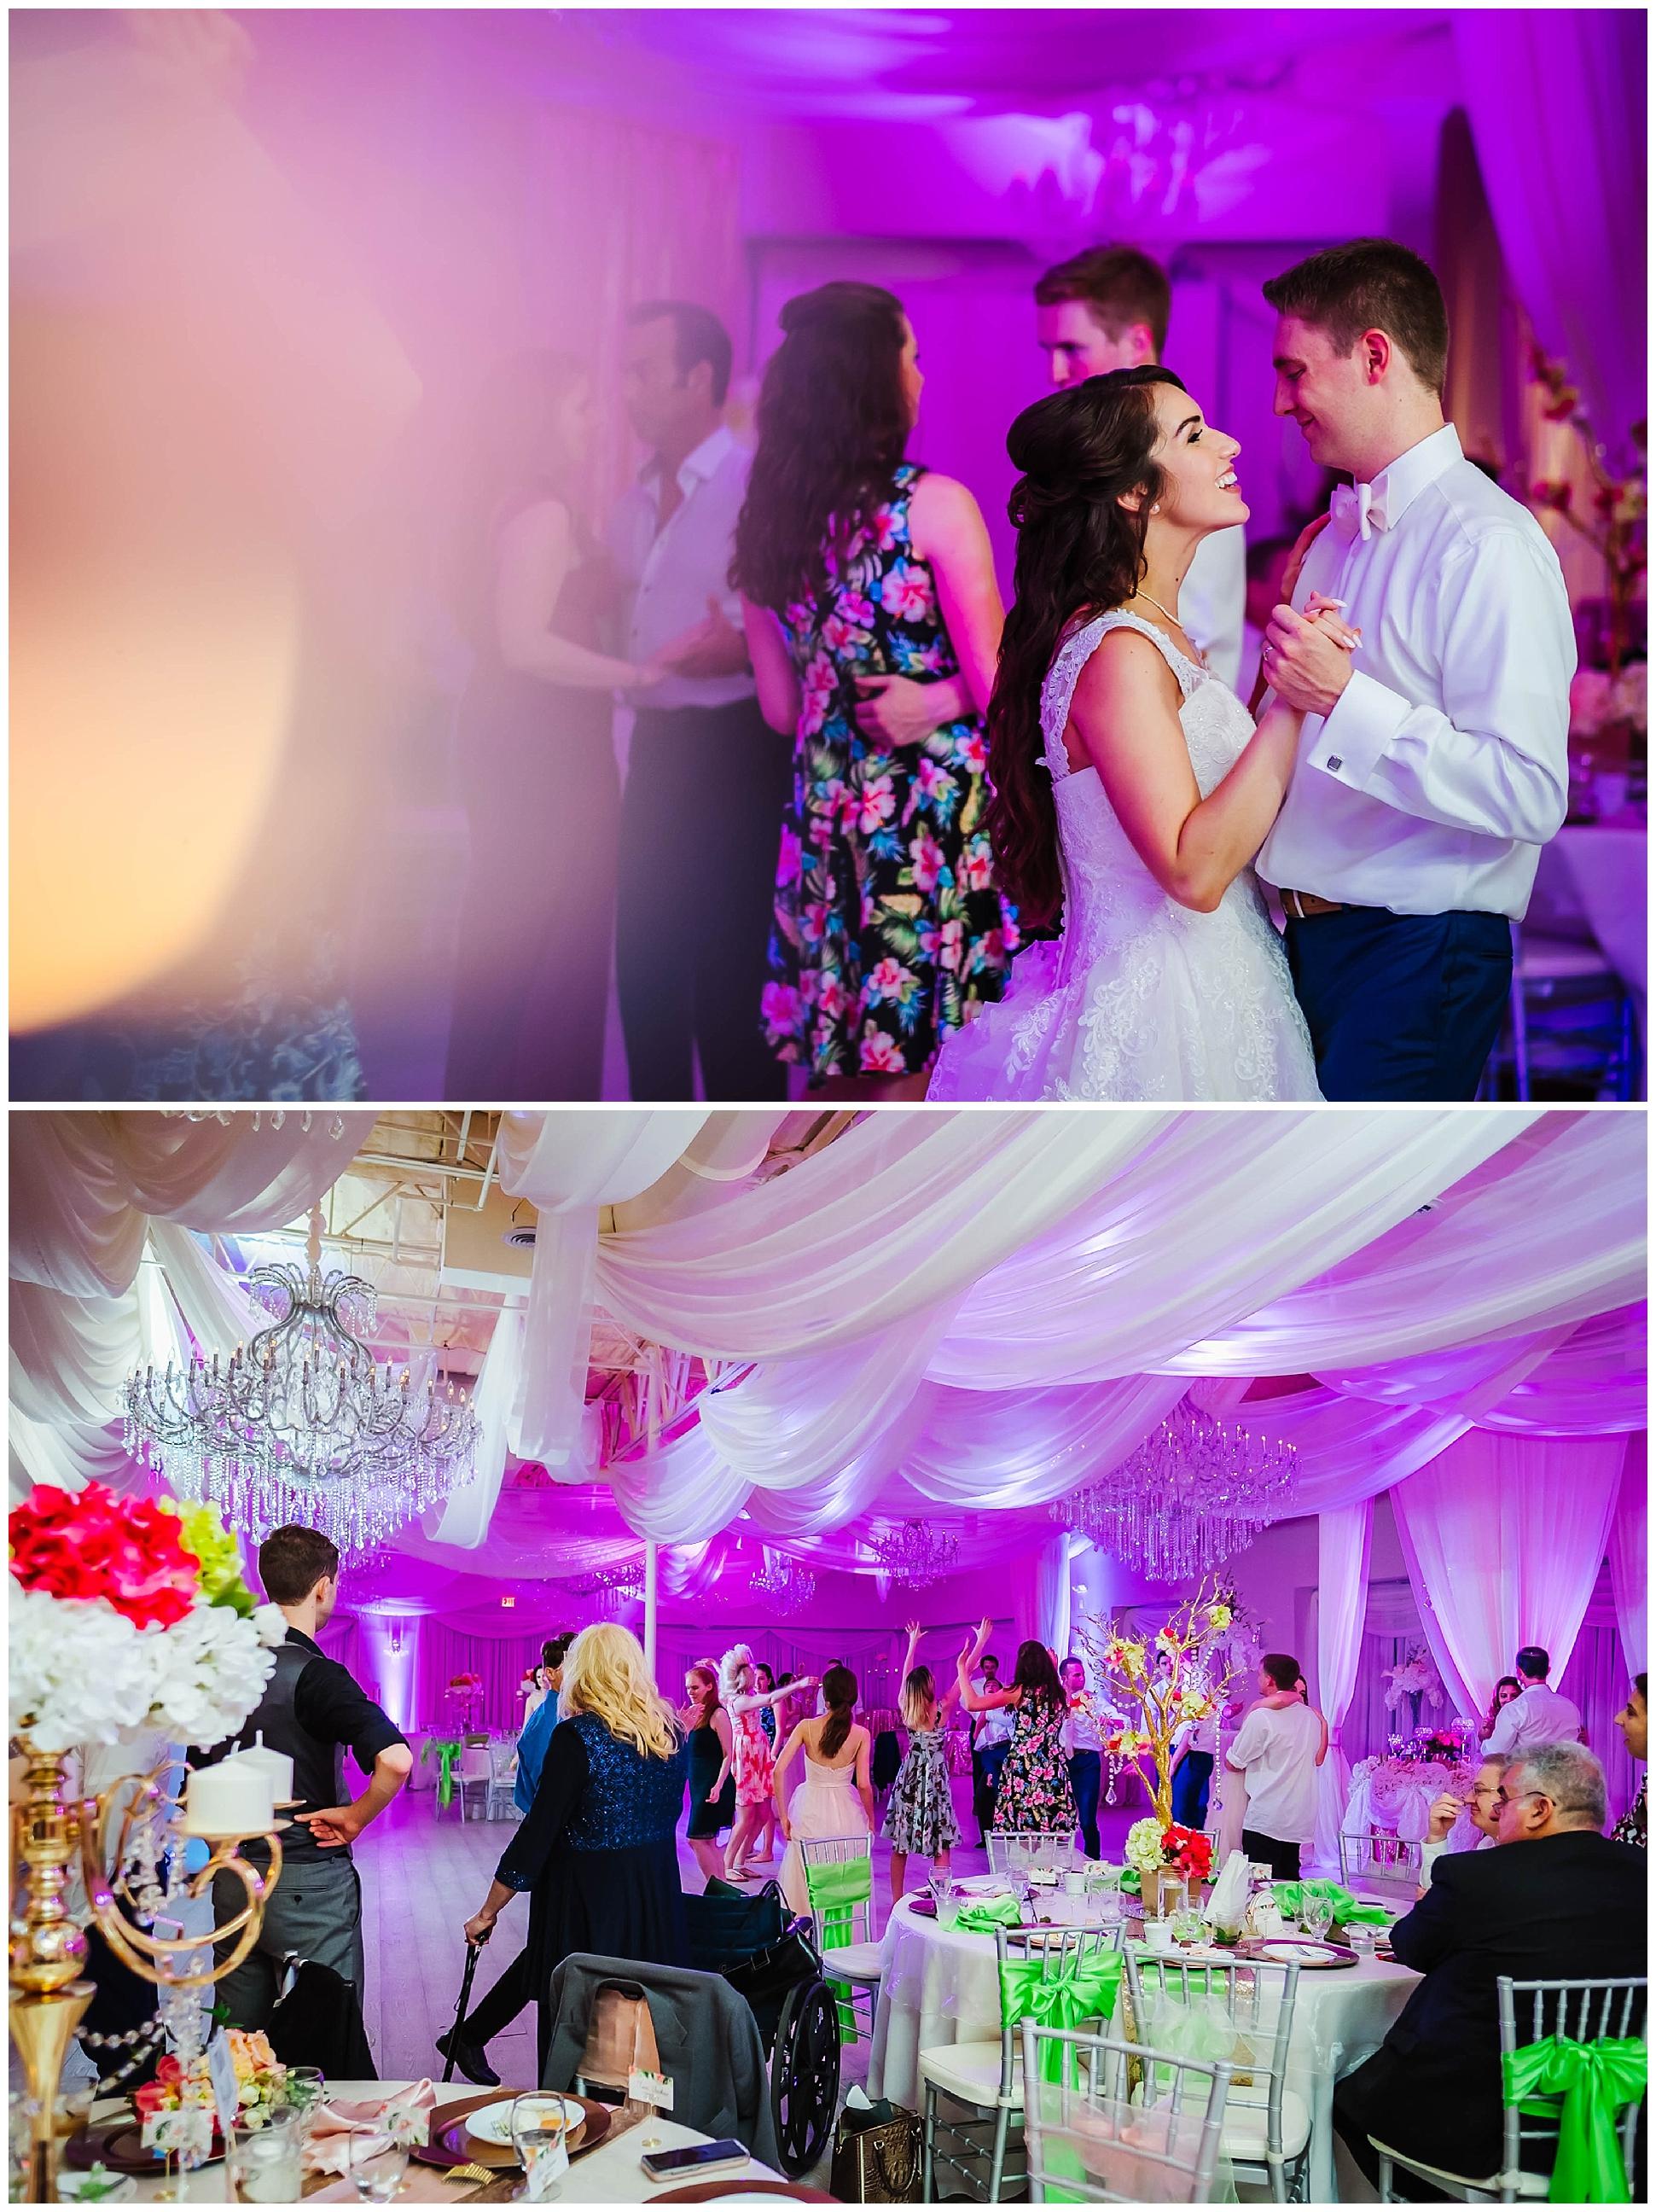 st-pete-wedding-photographer-sunken-gardens-crystal-ballroom-princess-dancer_0217.jpg